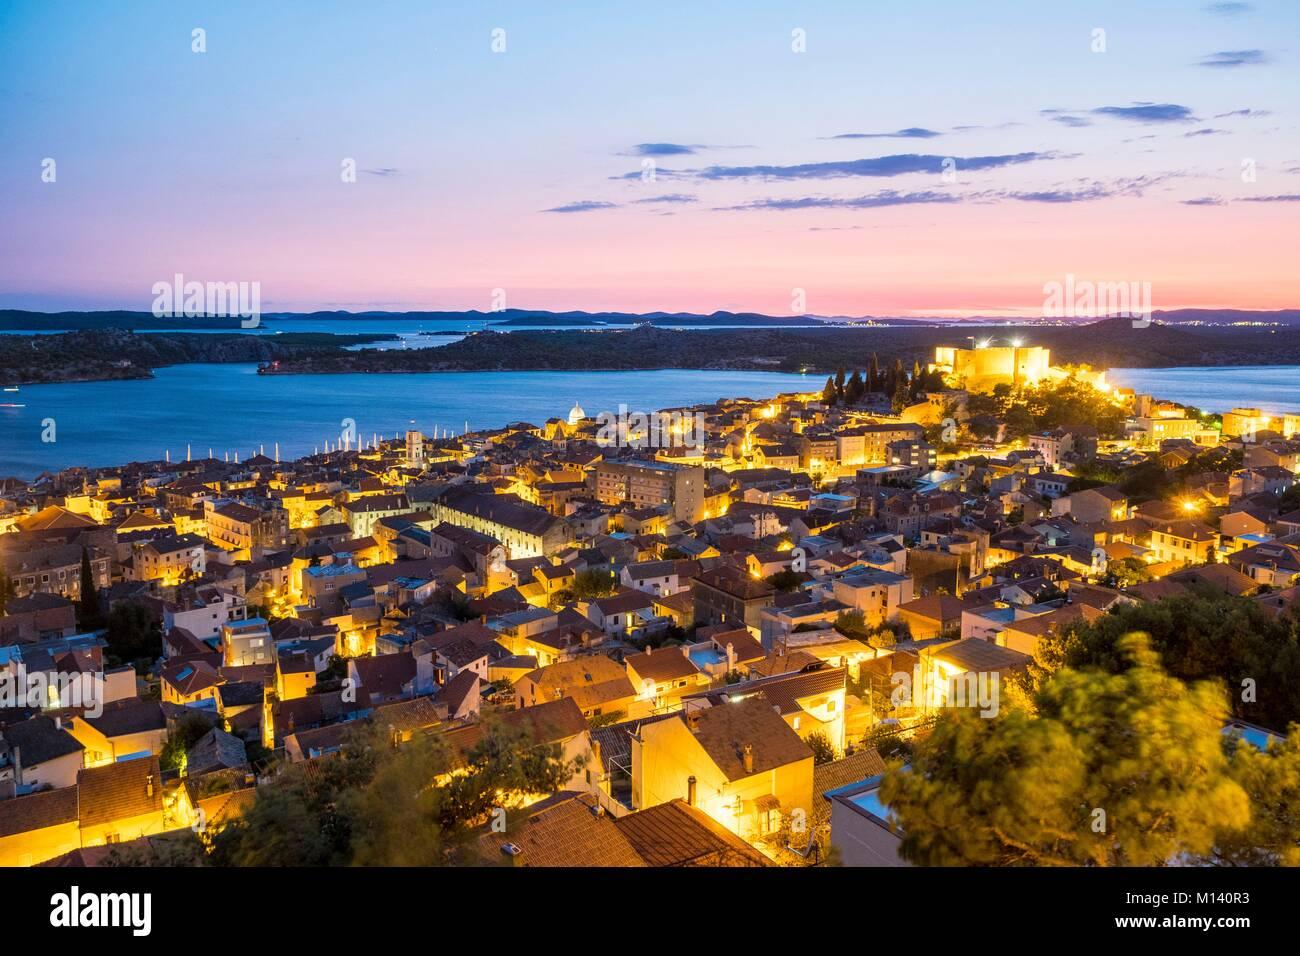 Croatia, North Dalmatia, Dalmatian coast, Sibenik, Saint Michael's fortress - Stock Image